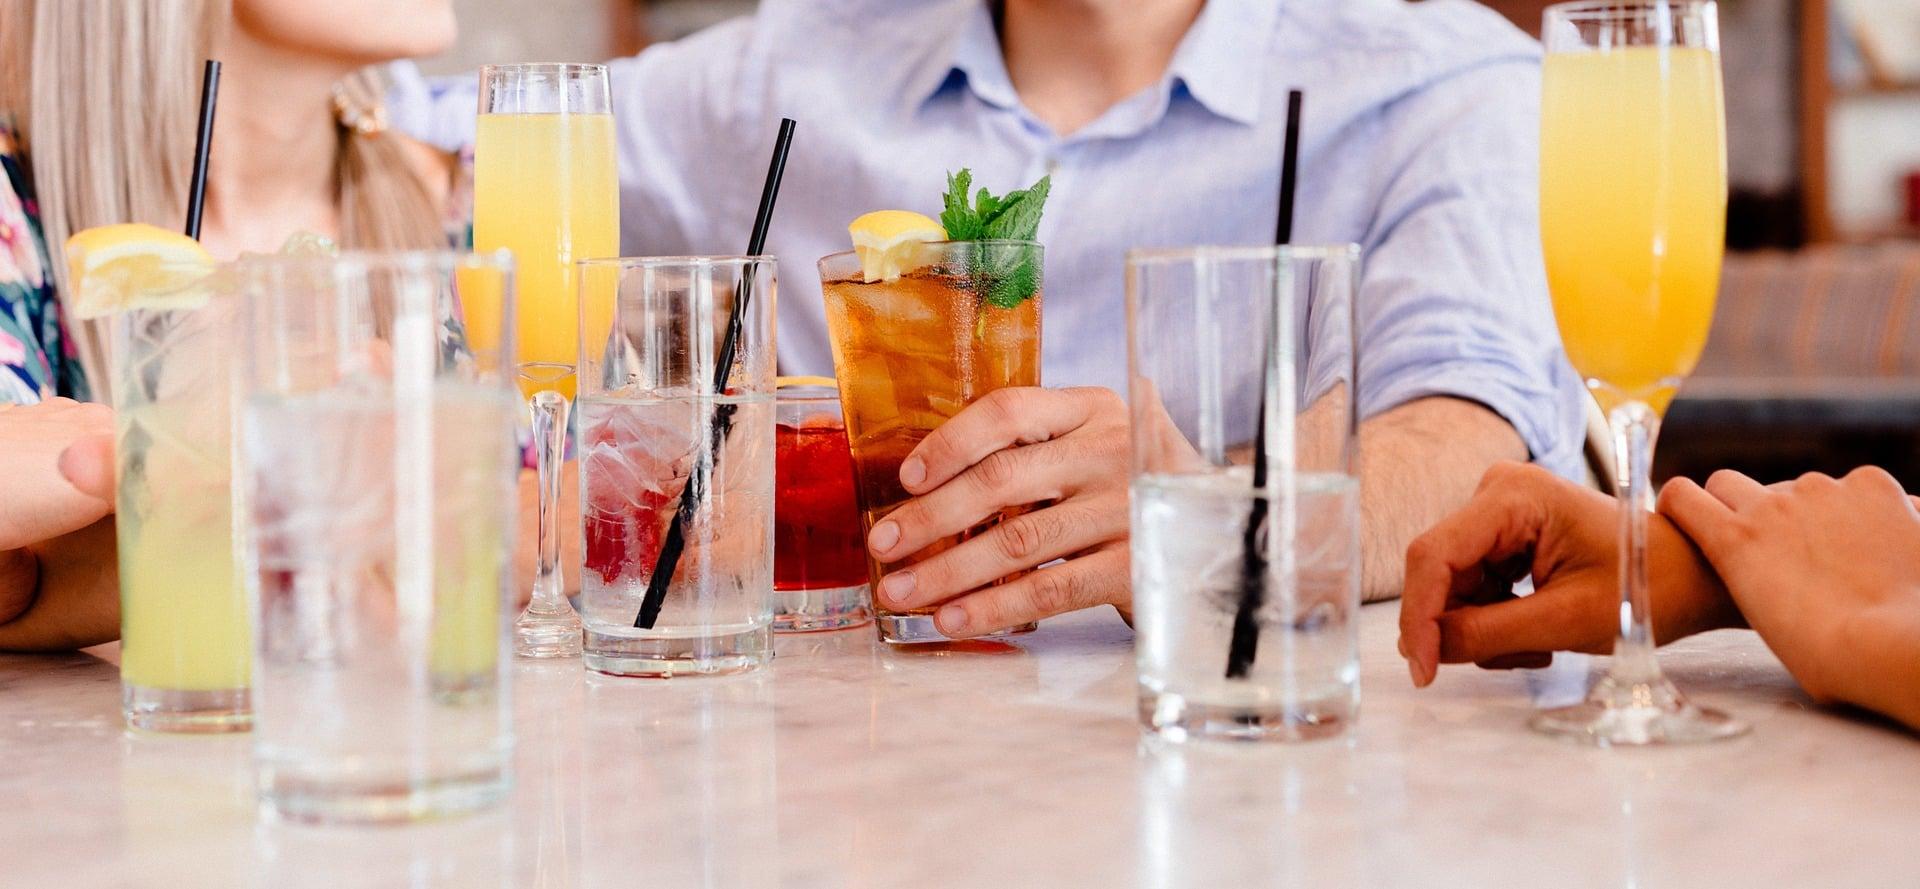 cocktails 1149171 1920